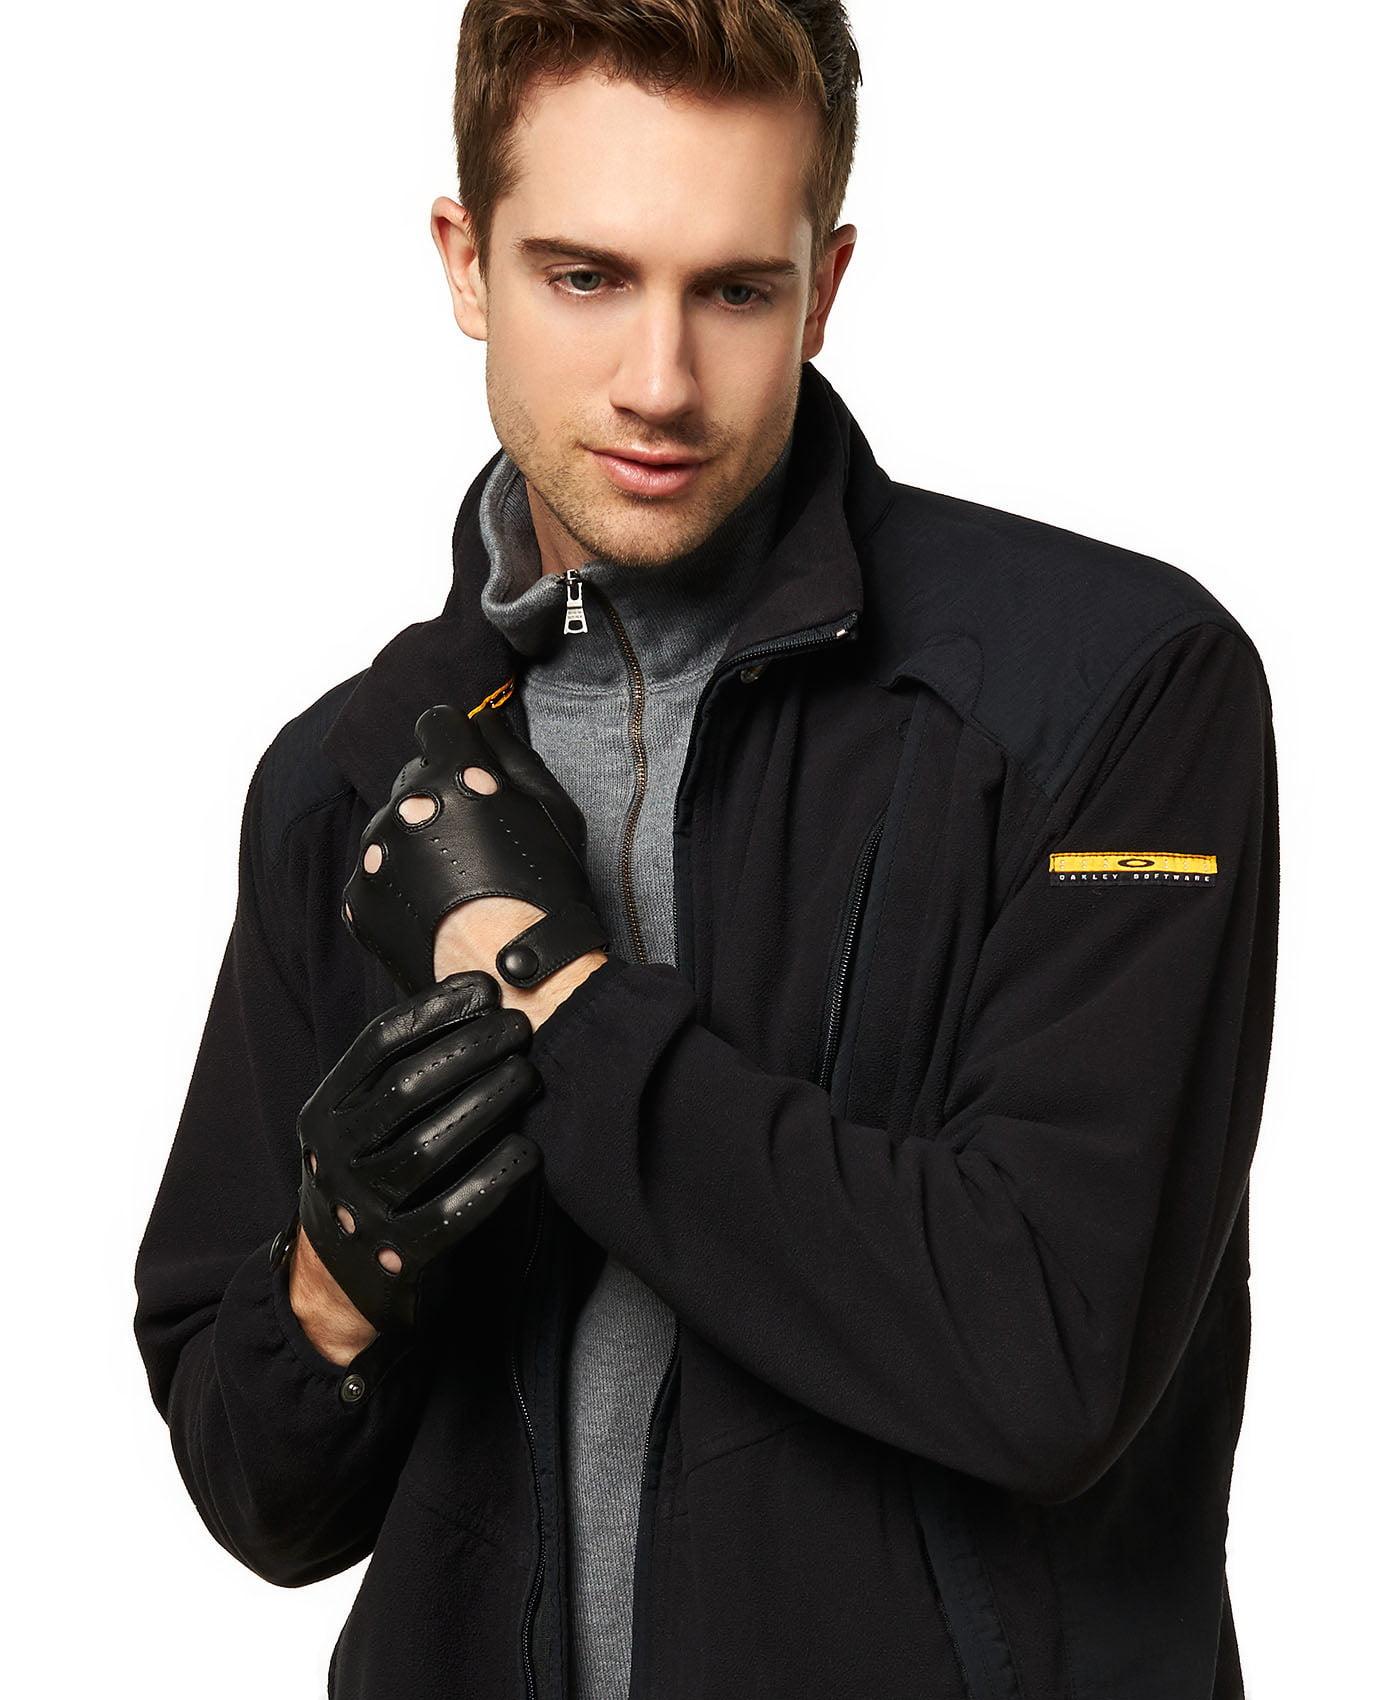 Driving gloves at walmart - Fratelli Orsini Everyday Men S Italian Lambskin Leather Driving Gloves Walmart Com